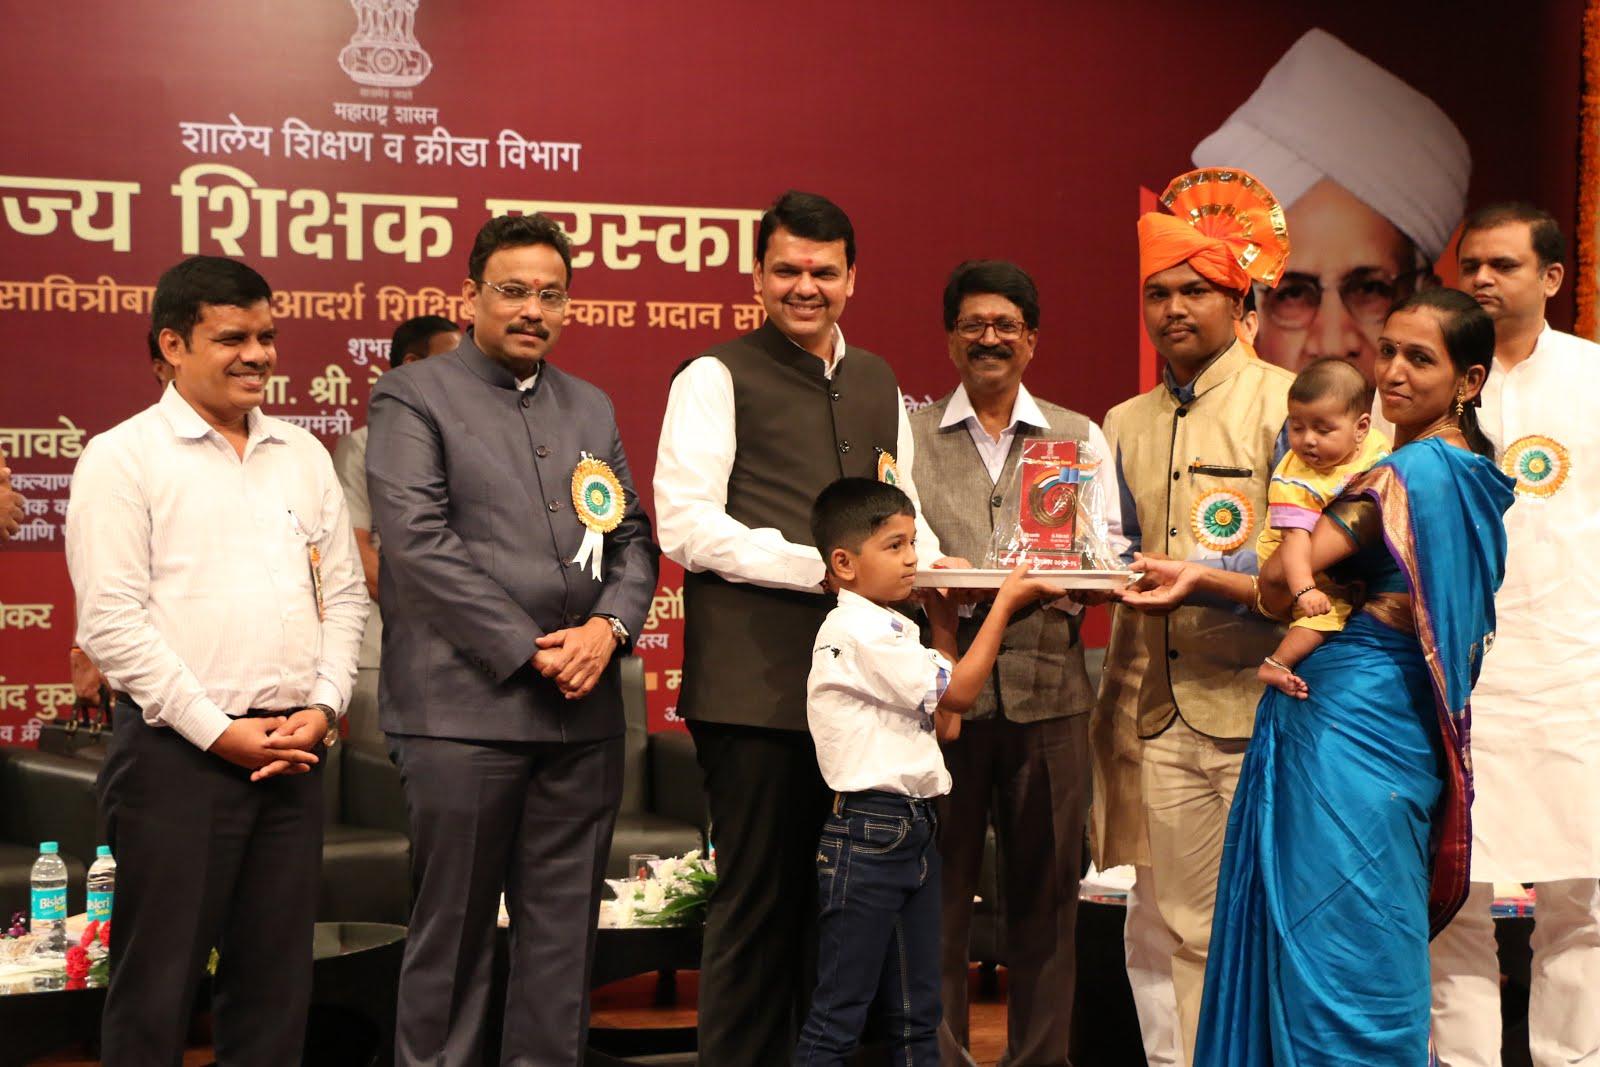 राज्य आदर्श शिक्षक पुरस्कार